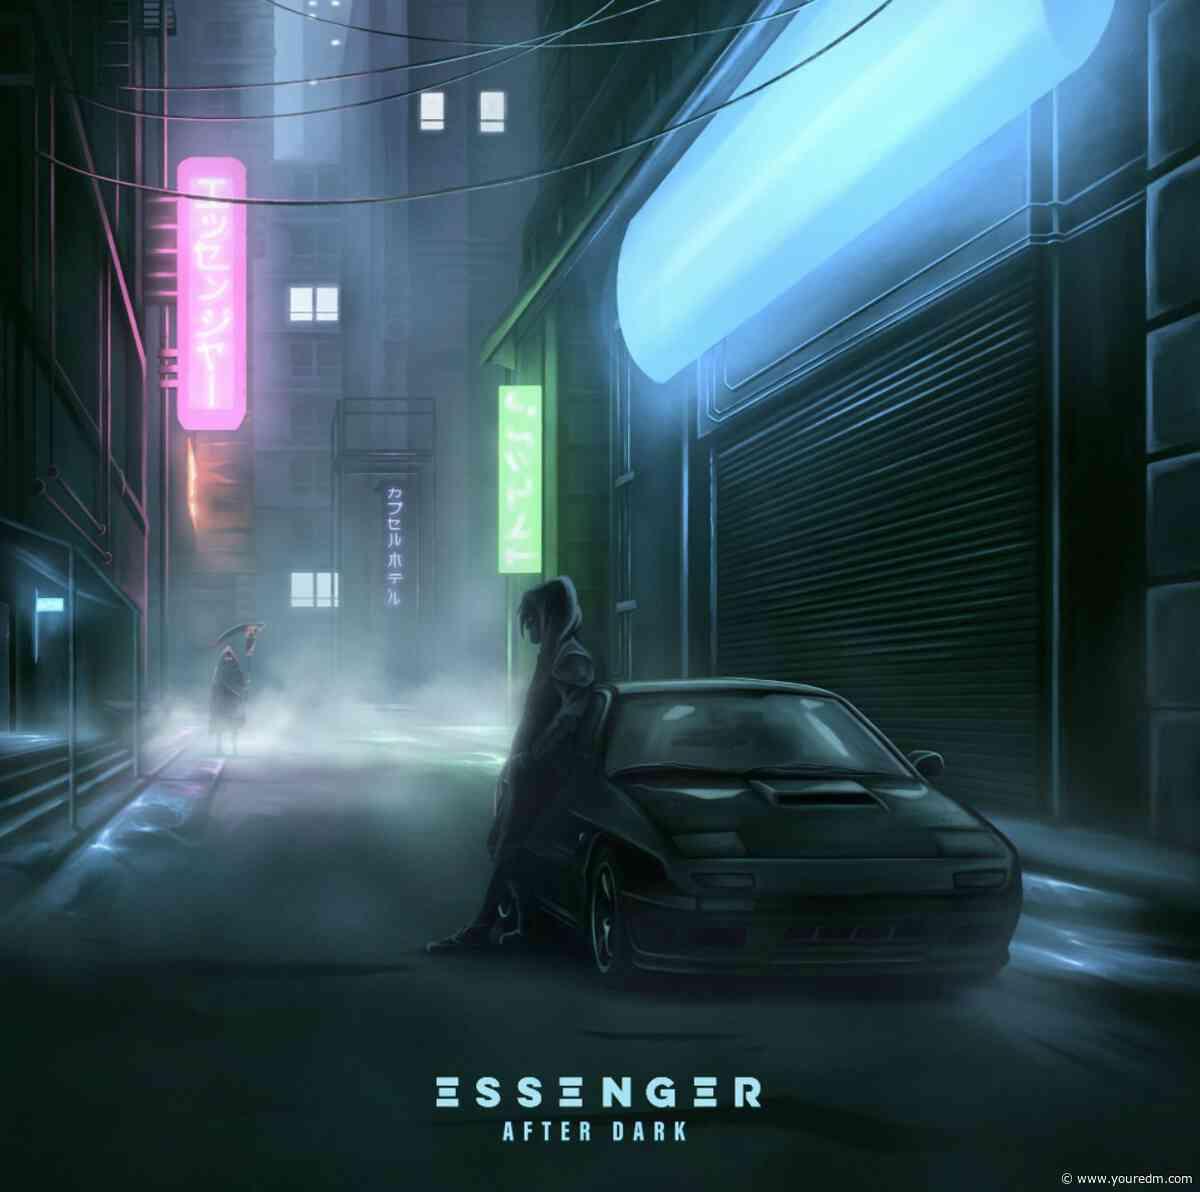 Essenger's 'After Dark' Is Another Spectacular Release [FiXT Neon]